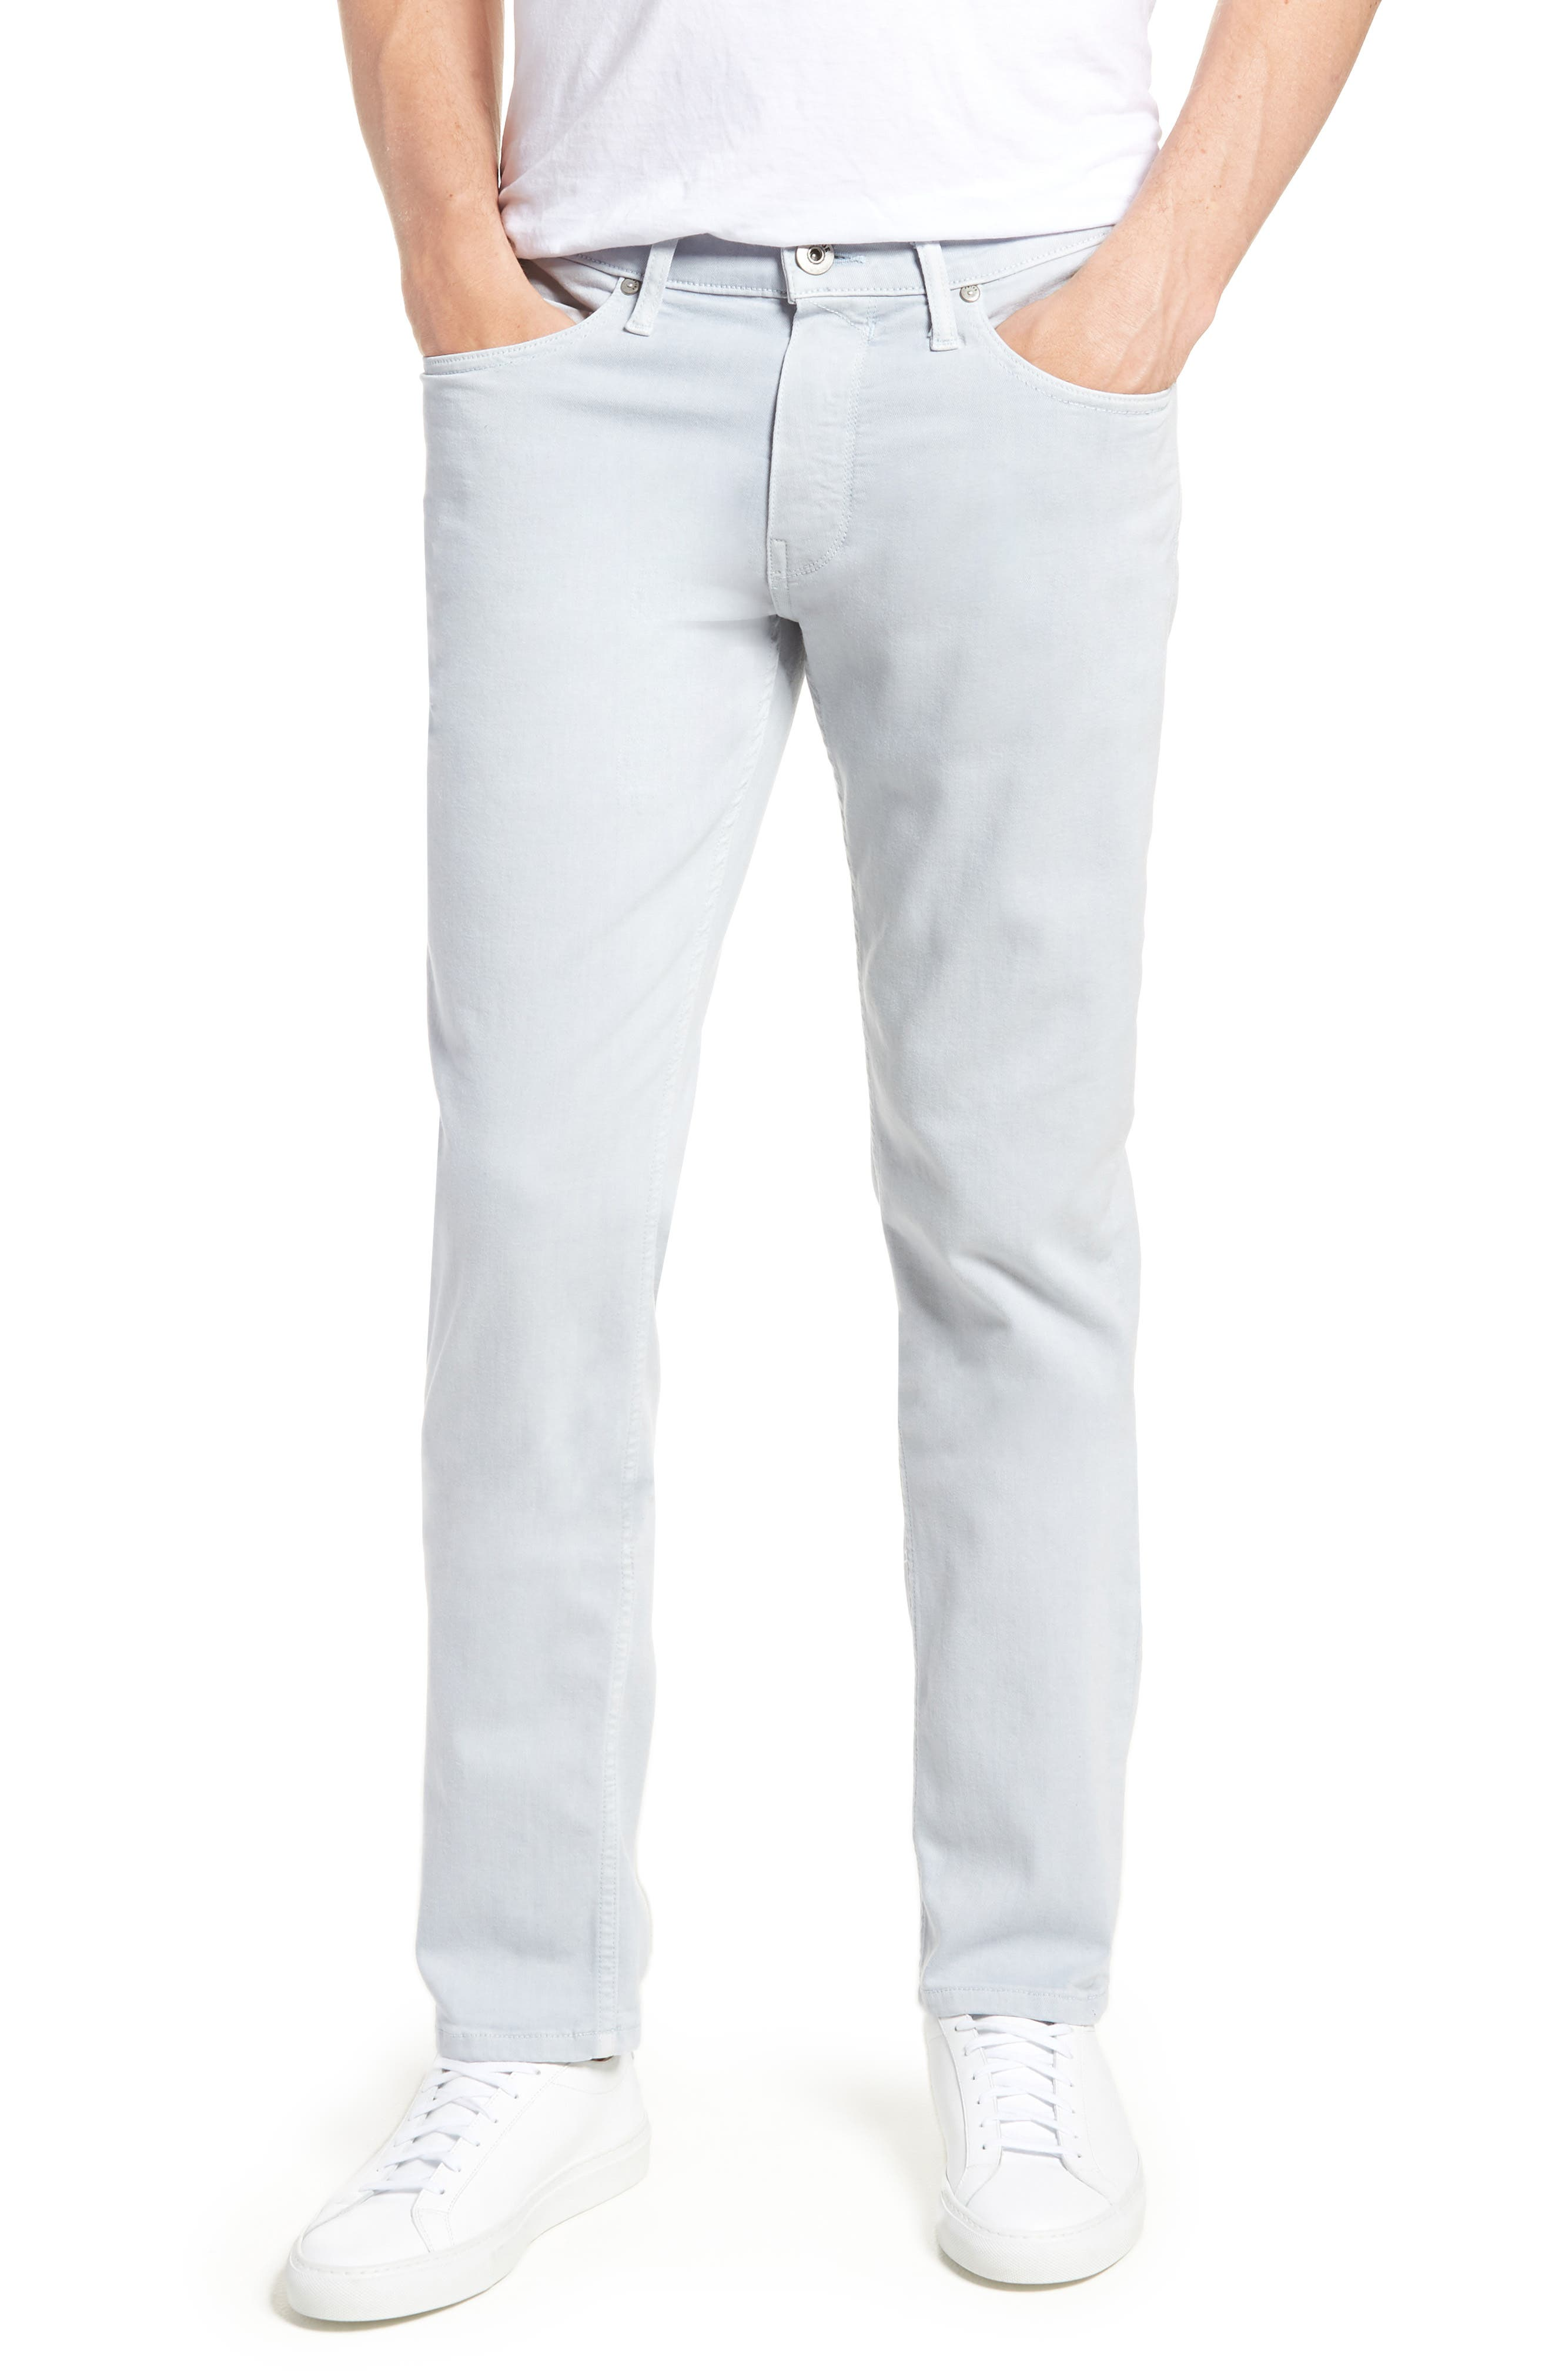 Transcend - Federal Slim Straight Leg Jeans,                             Main thumbnail 1, color,                             450